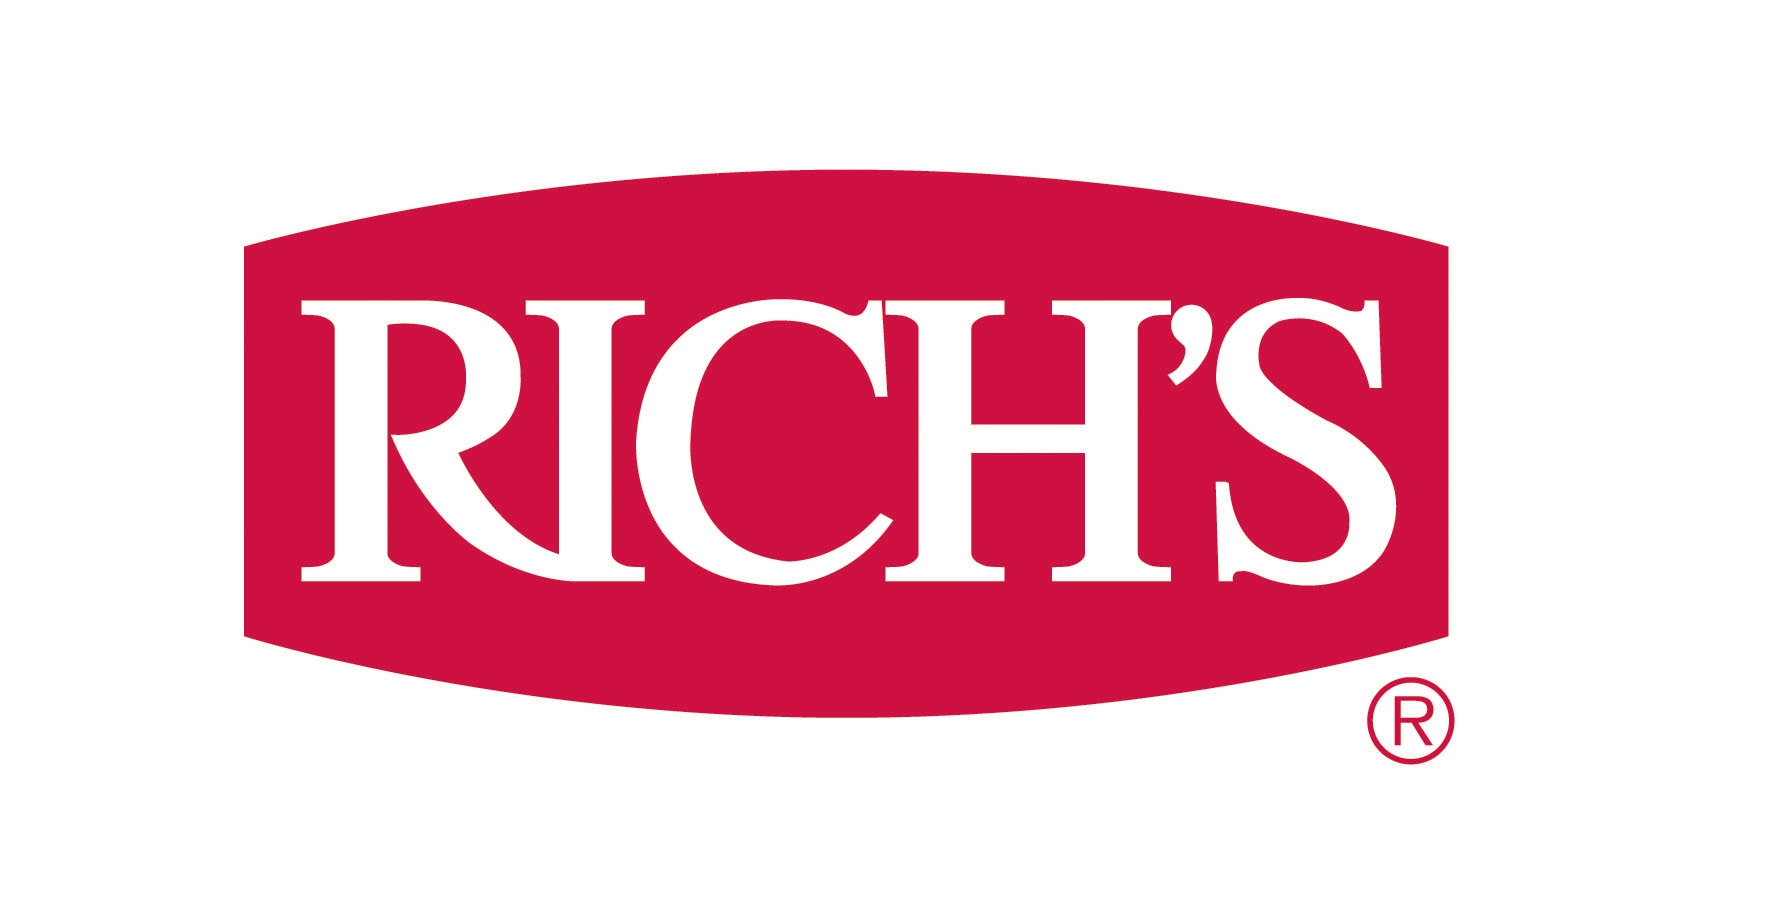 Rich's Logo pms 200 RGB – FC Buffalo